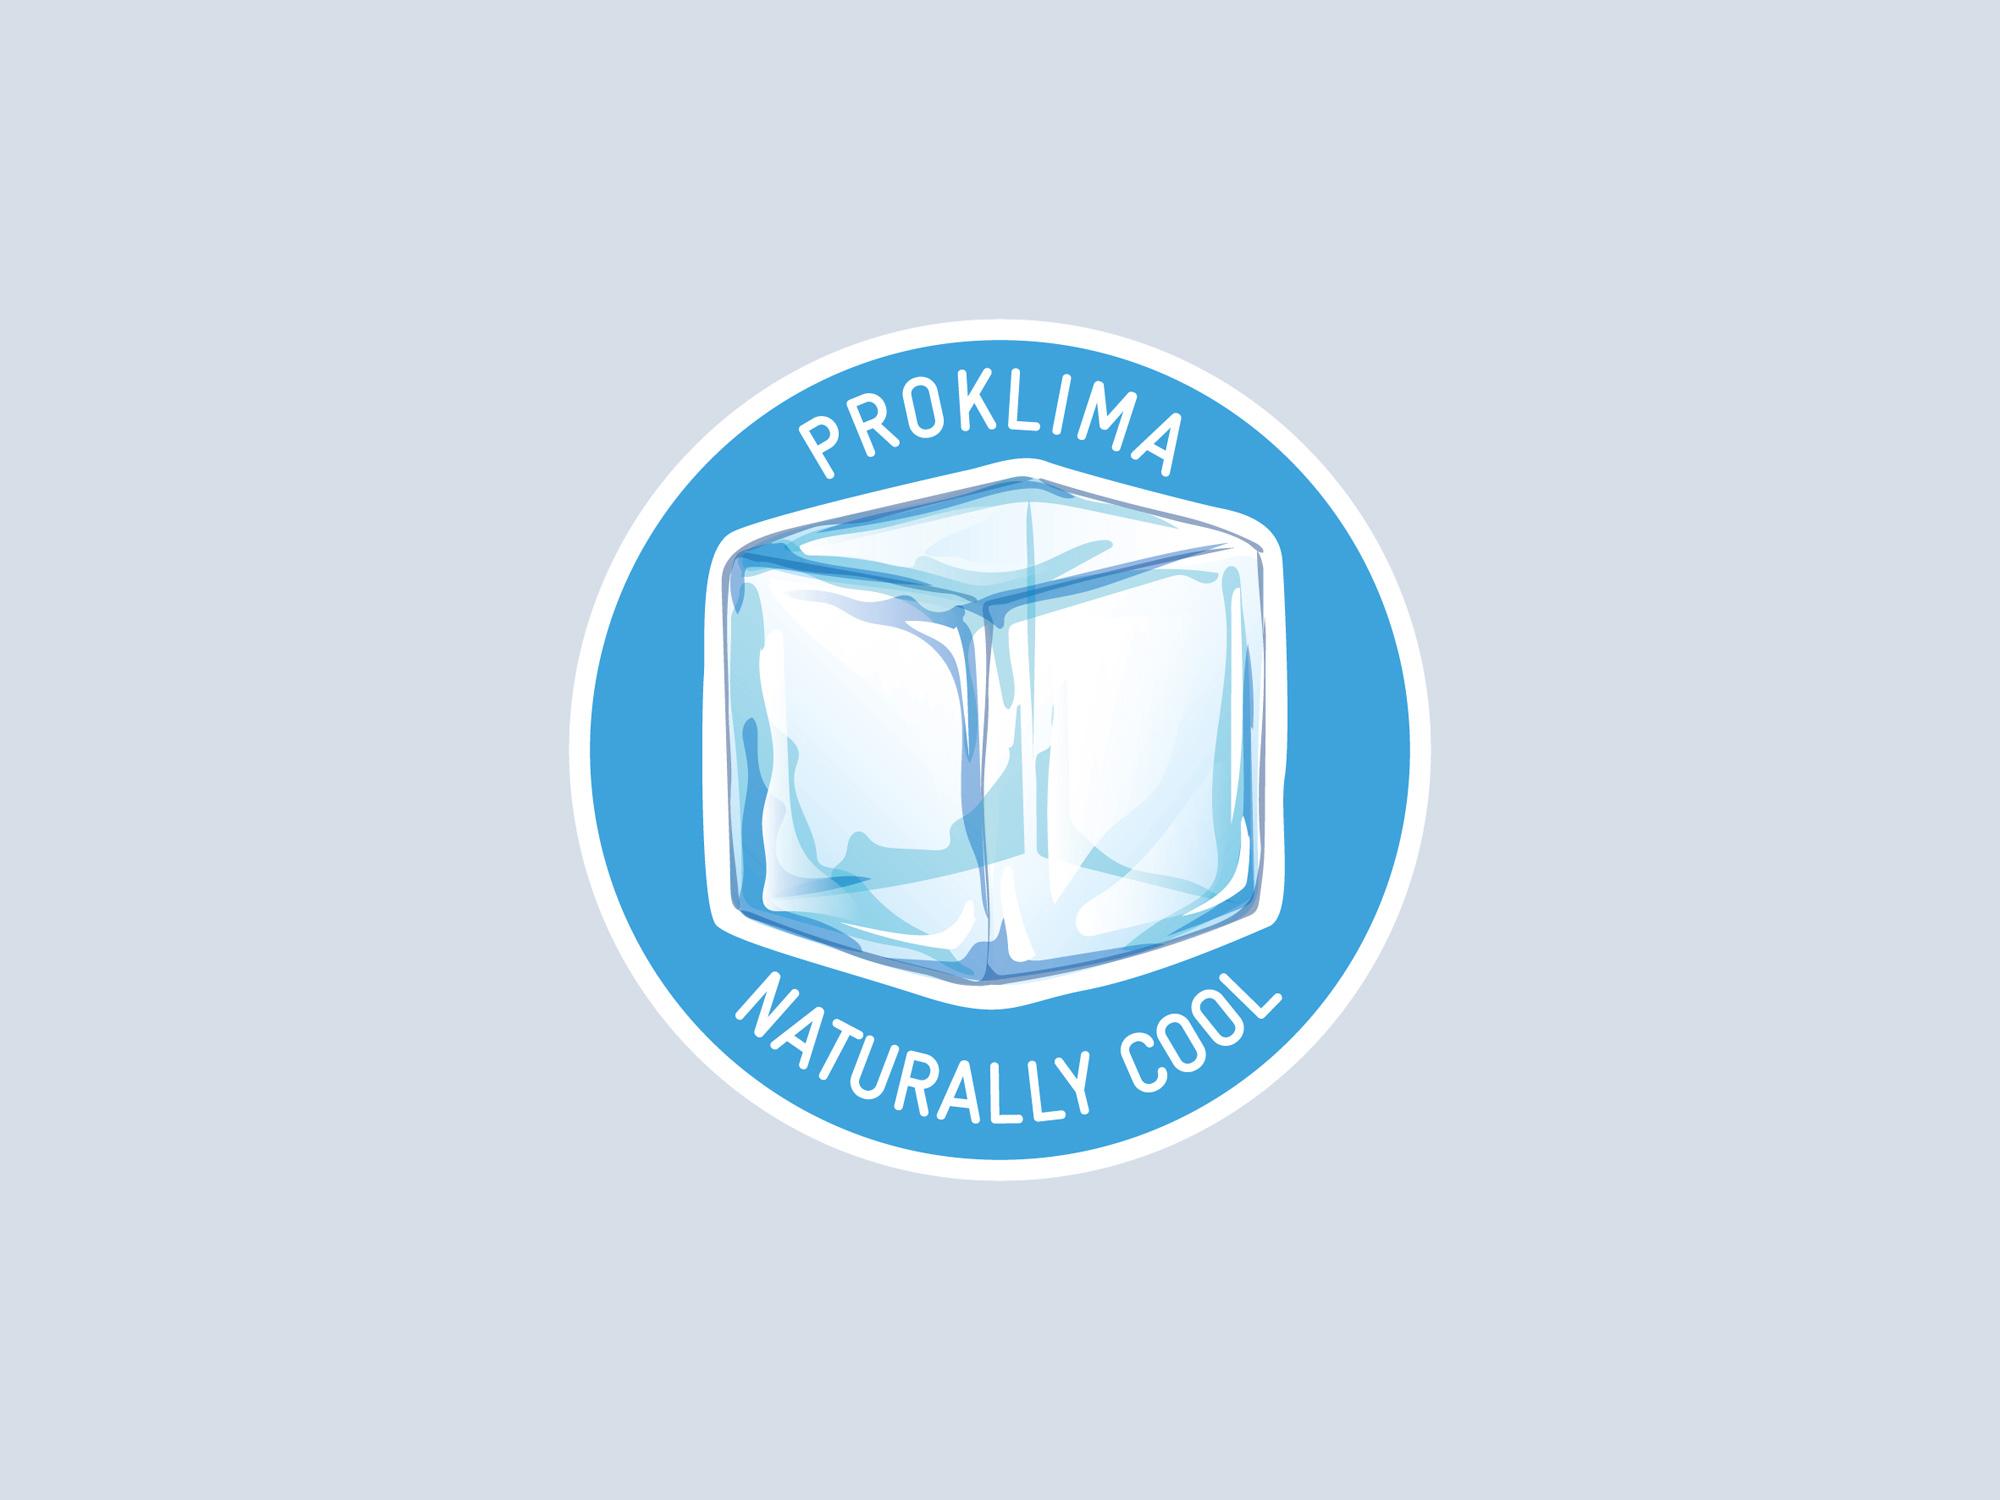 Proklima – naturally cool